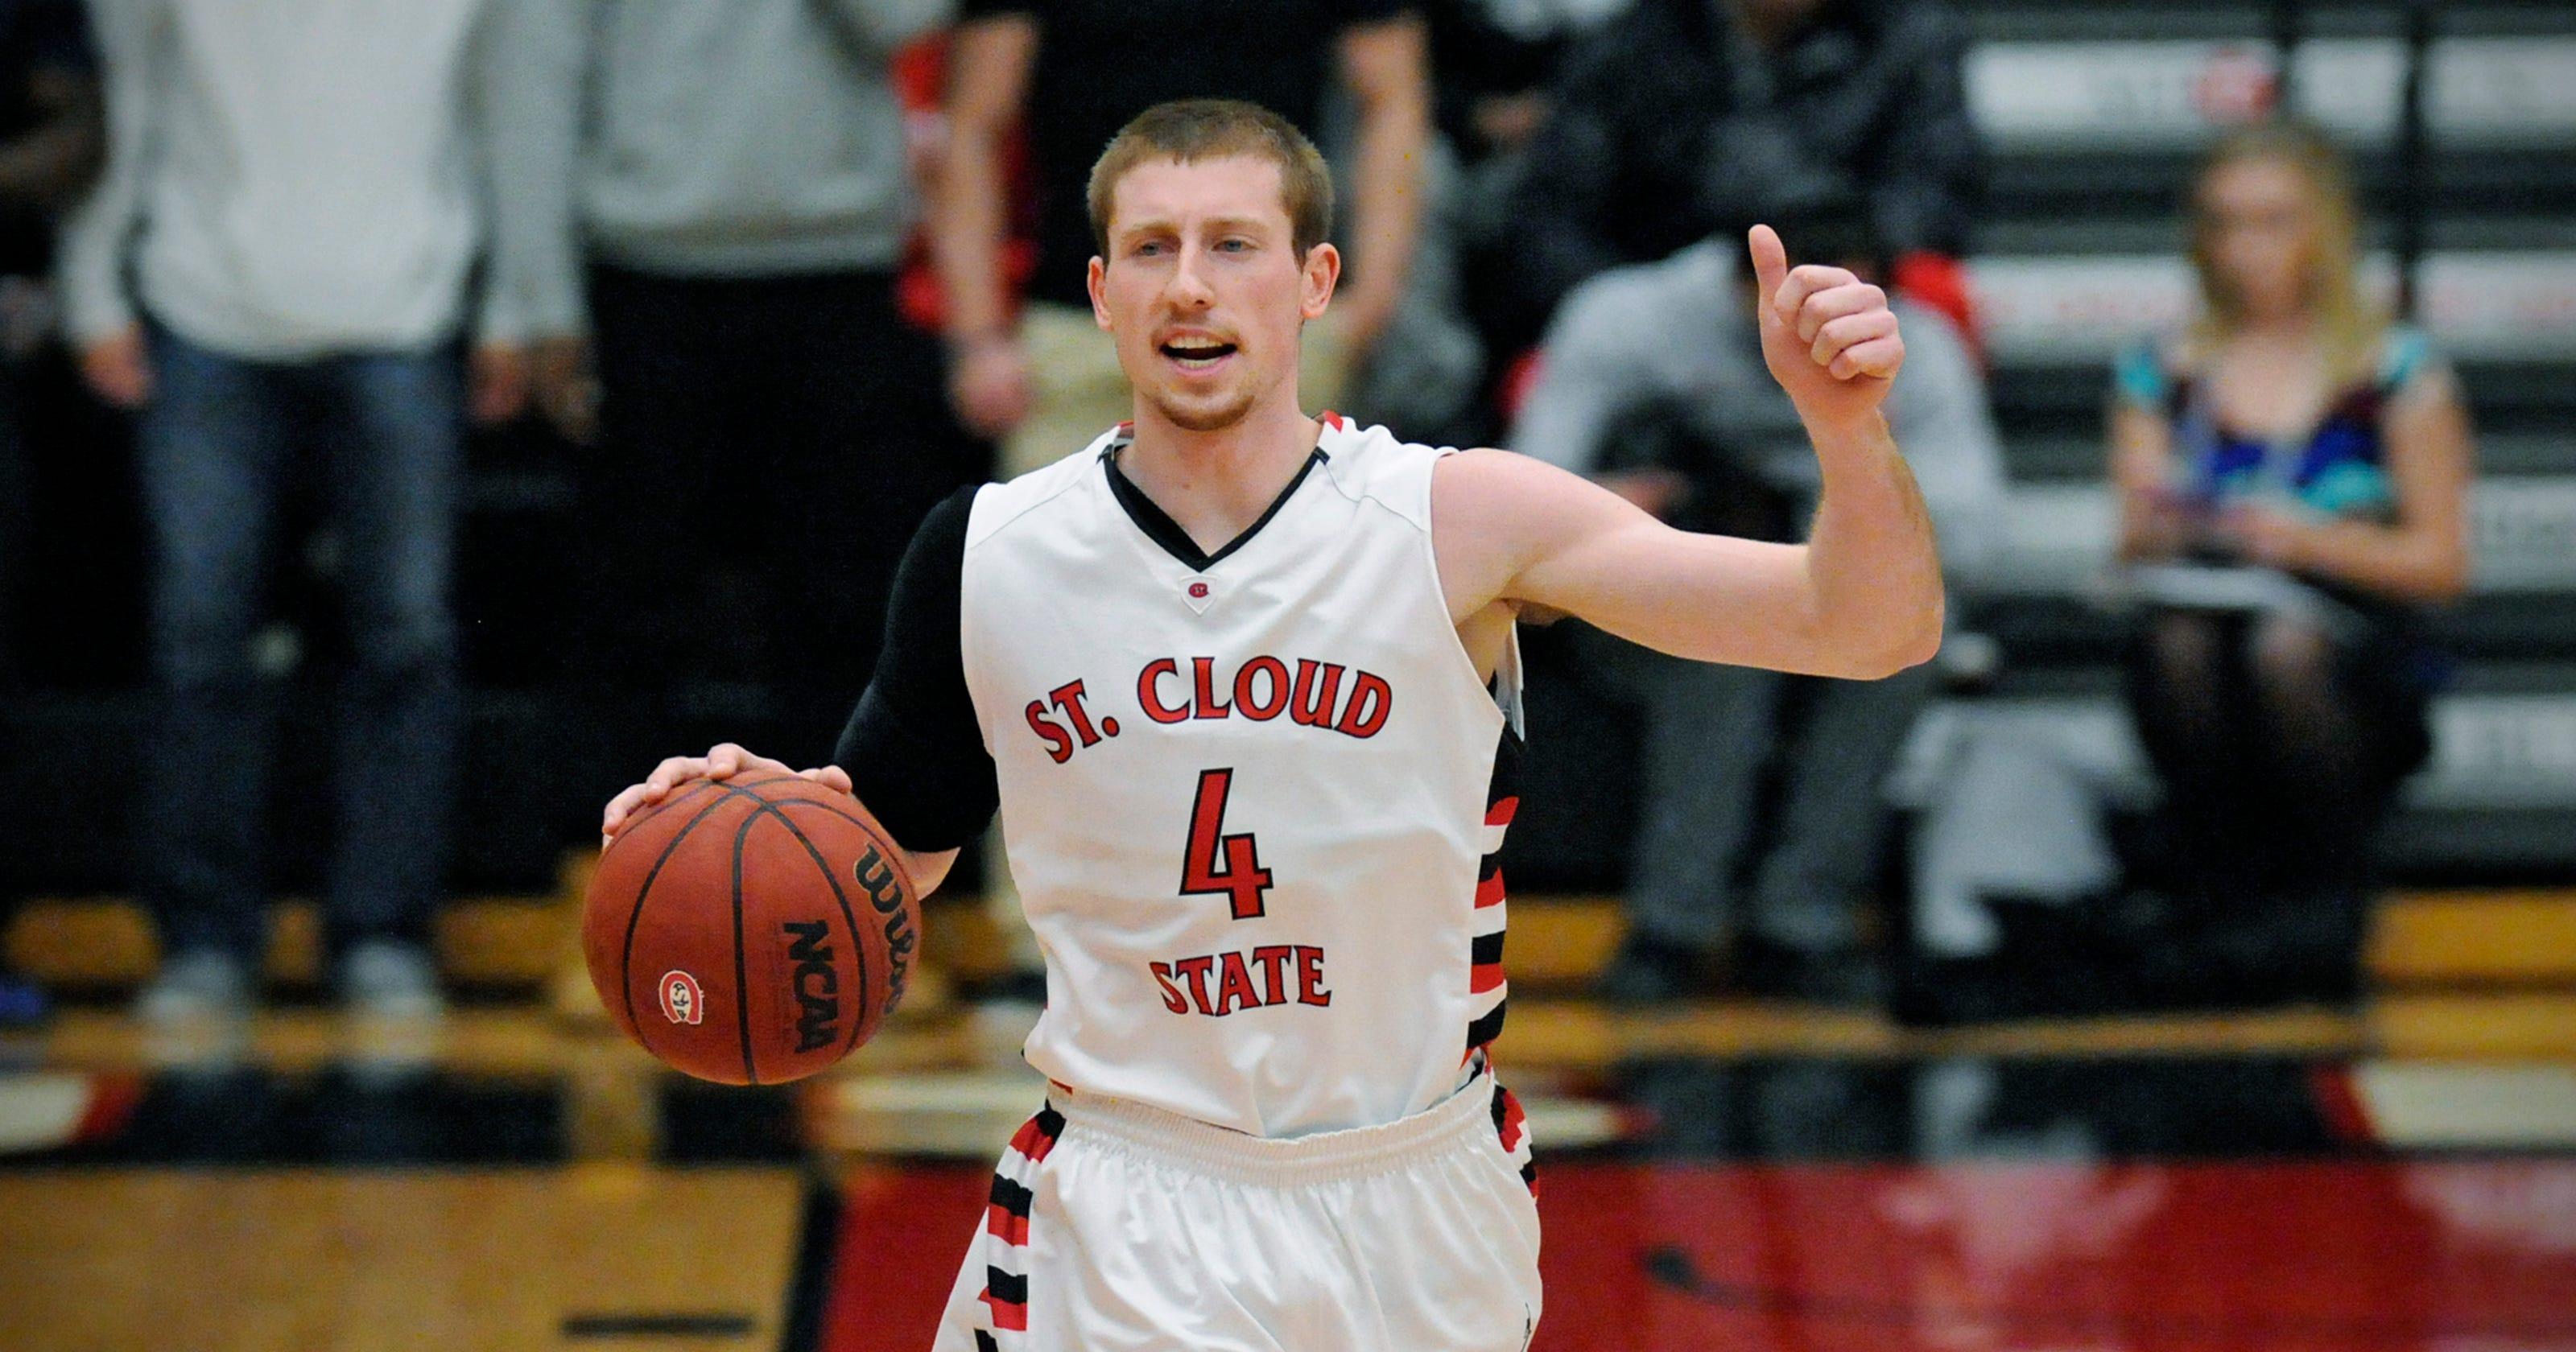 SCSU basketball: Injuries slowing Levandoski down